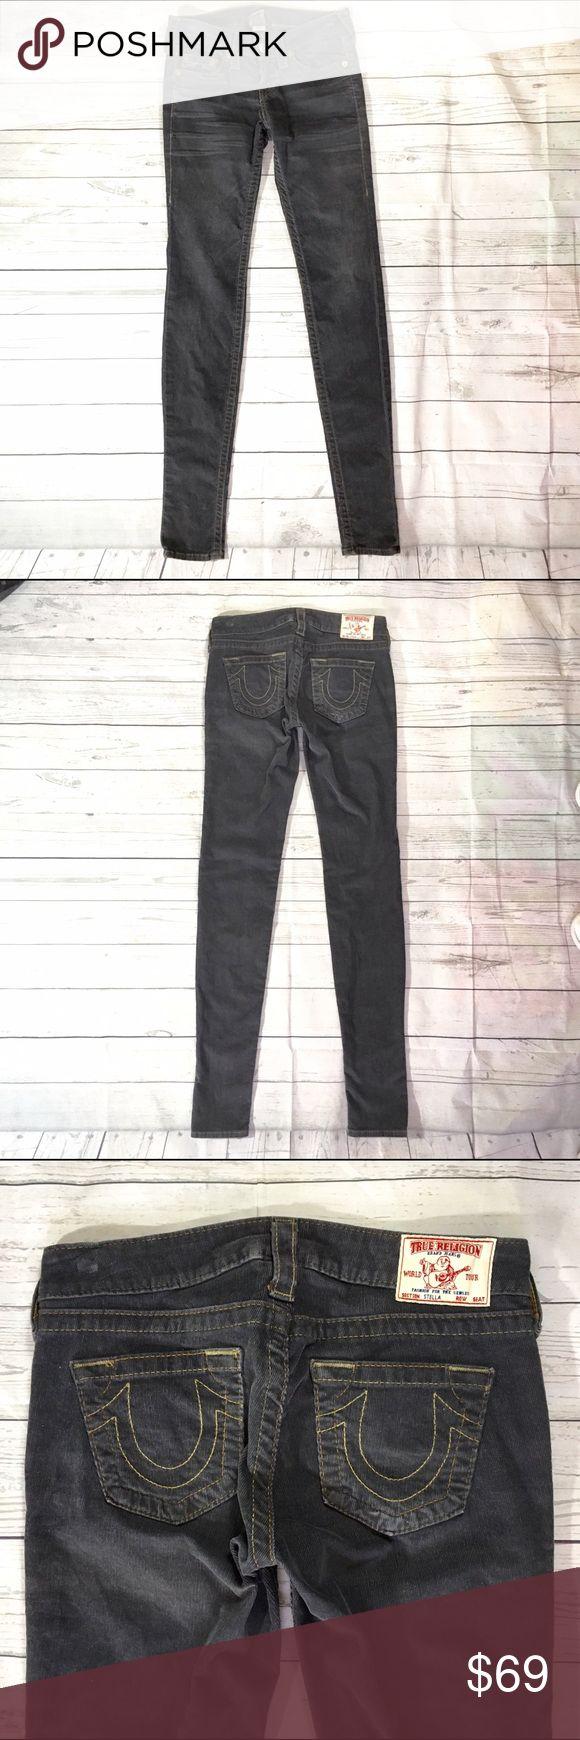 "True religion women's skinny pants sz 26 True religion women's skinny corduroys sz 26 gray low rise. 100% authentic. Embroidered pockets Color: graphite gray  Measurements:     - waist 14.5""    - Rise 7""    - inseam 34"" True Religion Jeans Skinny"